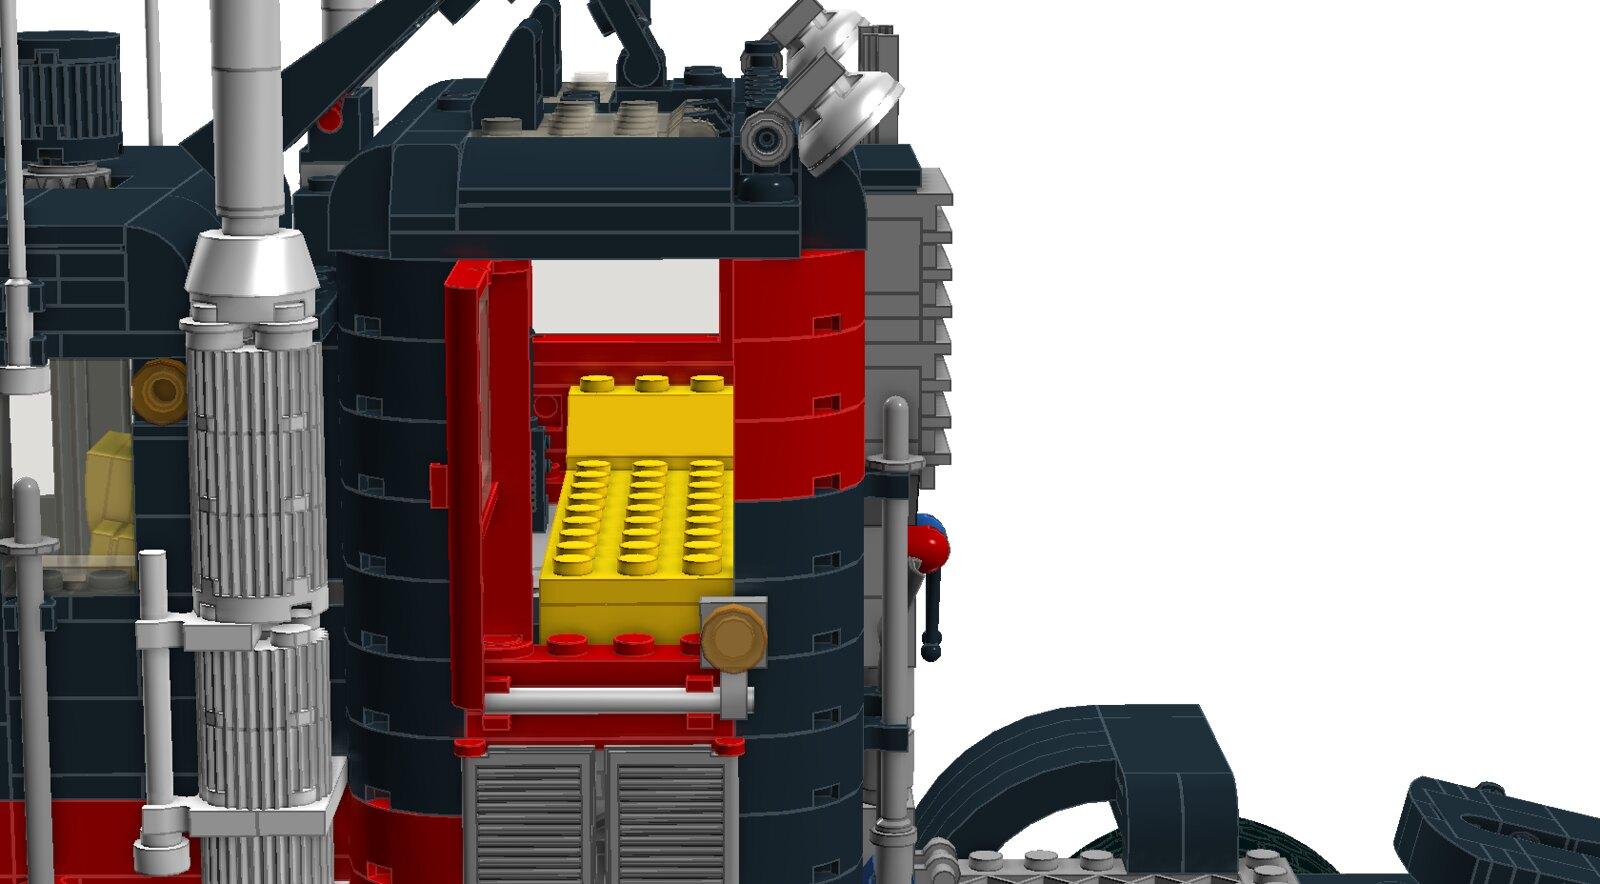 Ldd Moc Legacy Black Cat Truck Special Lego Themes Eurobricks